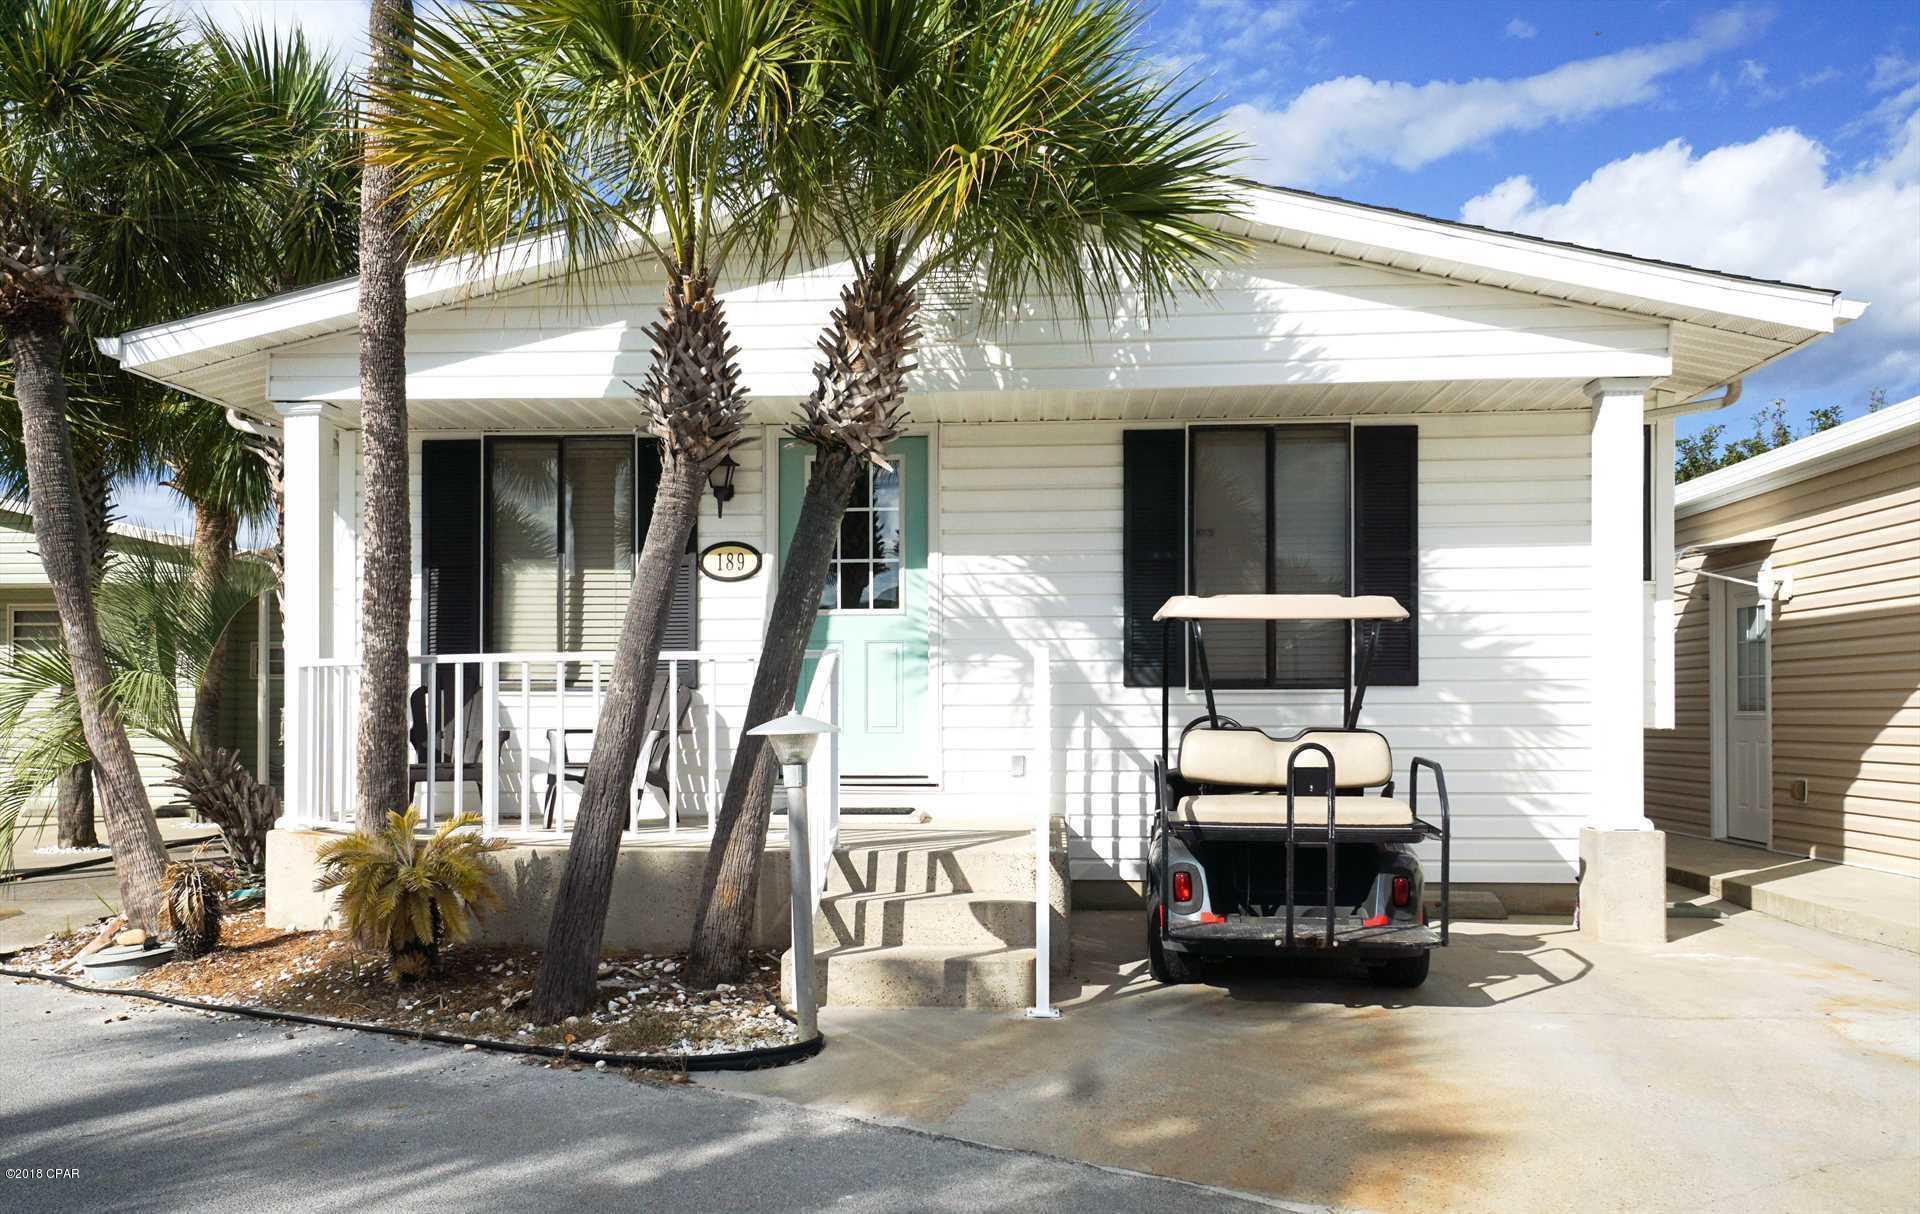 Photo of 189 MARLIN Drive Panama City Beach FL 32408